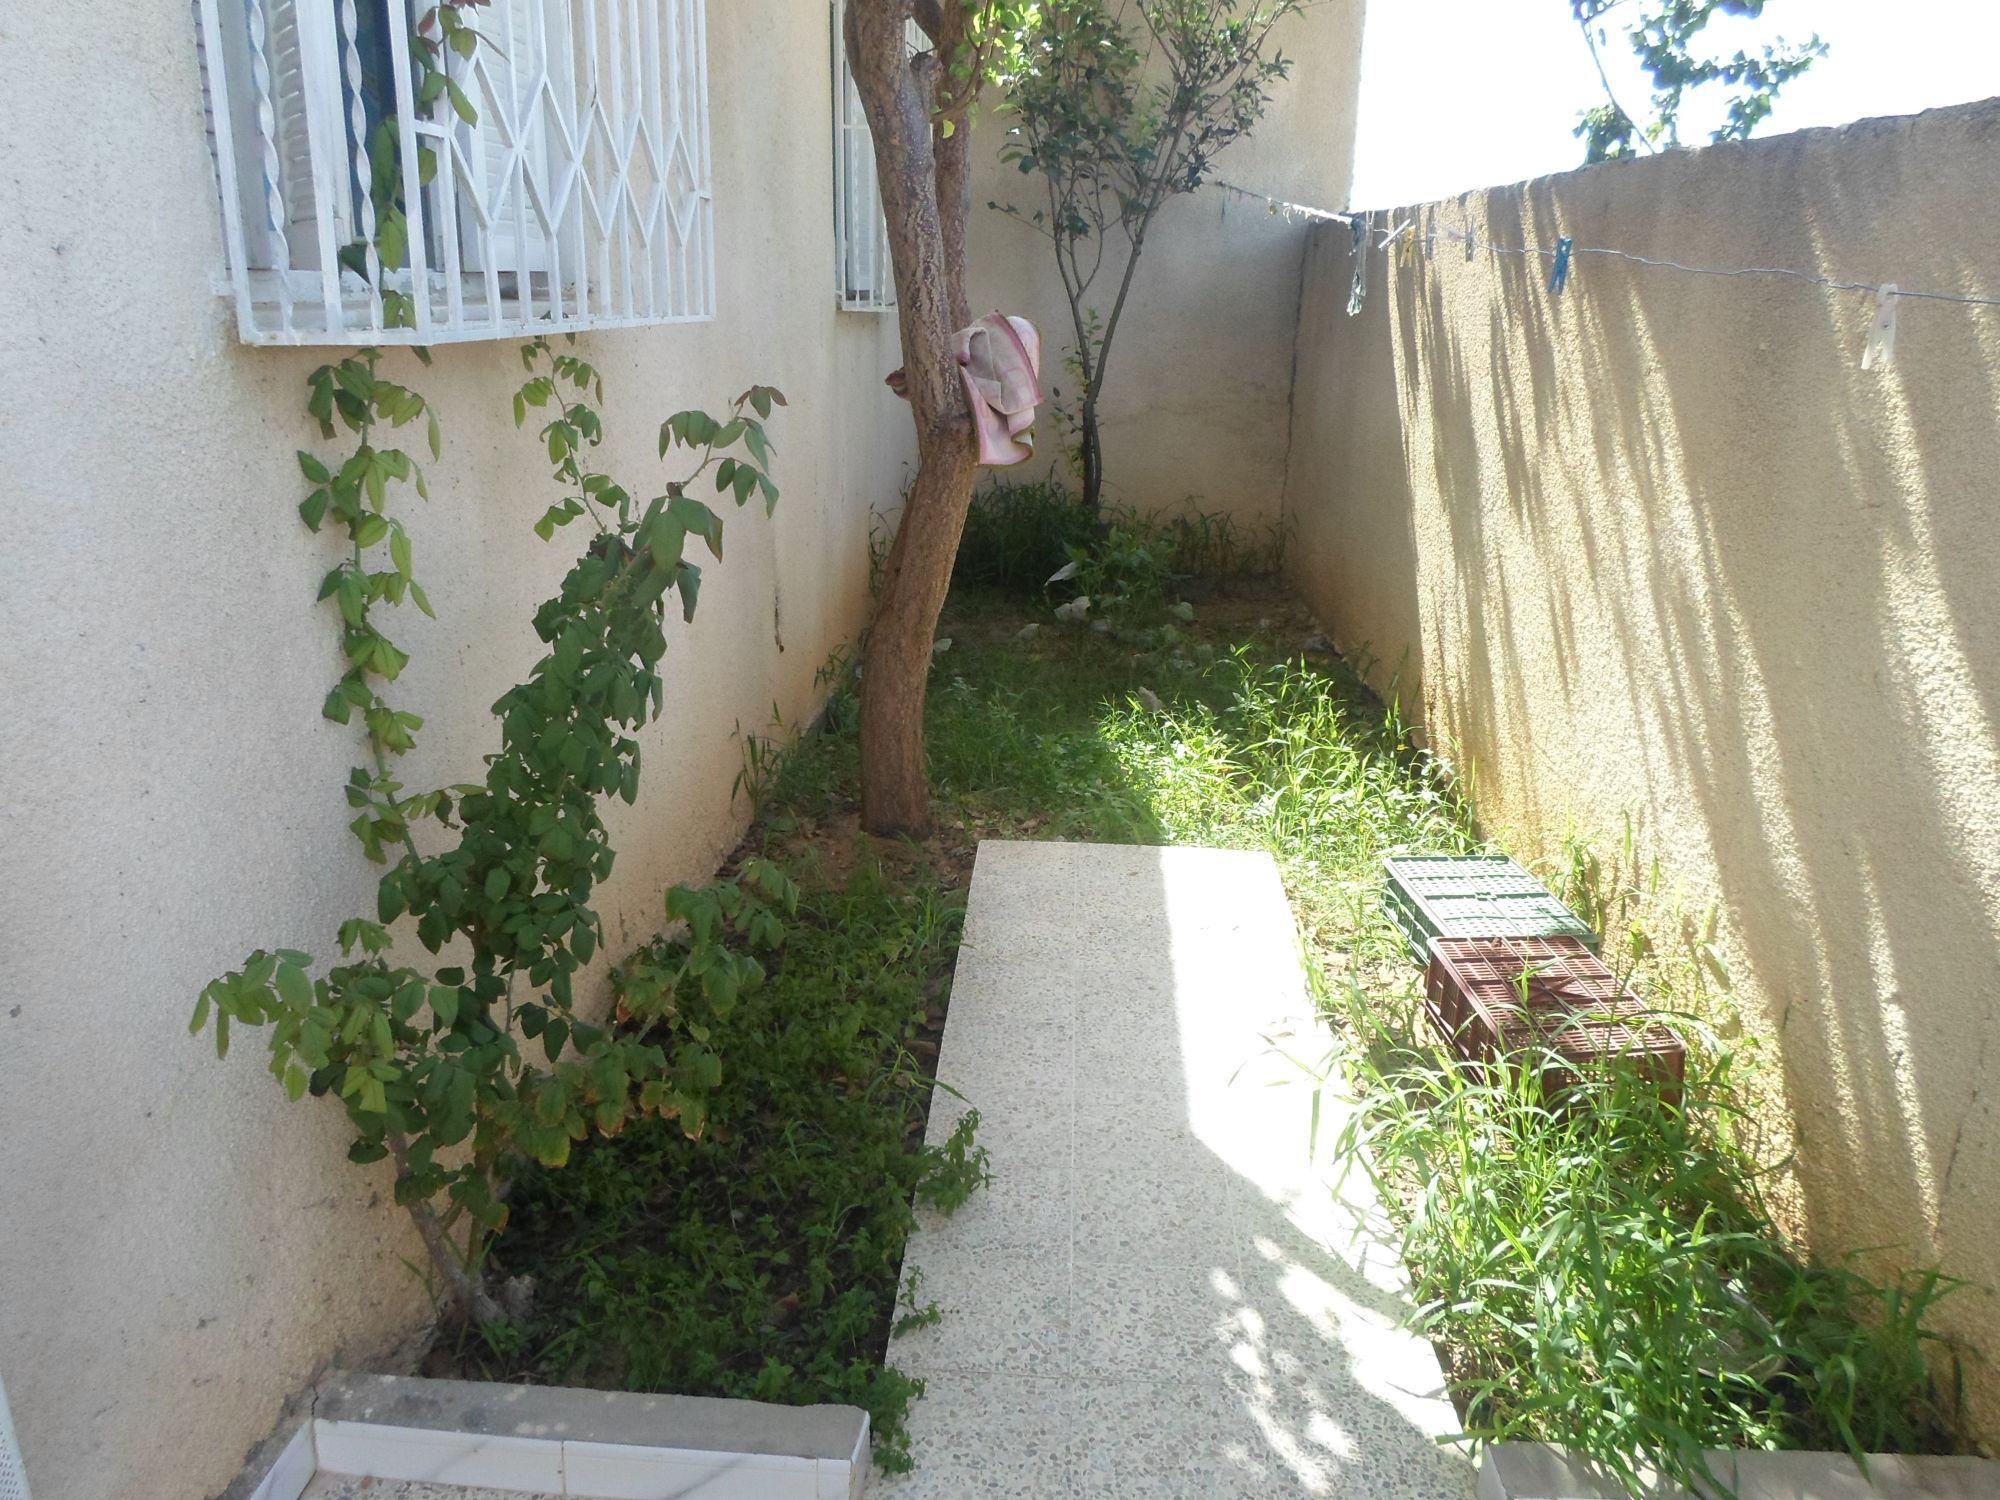 Av une belle maison aux arrondissements de hammamet